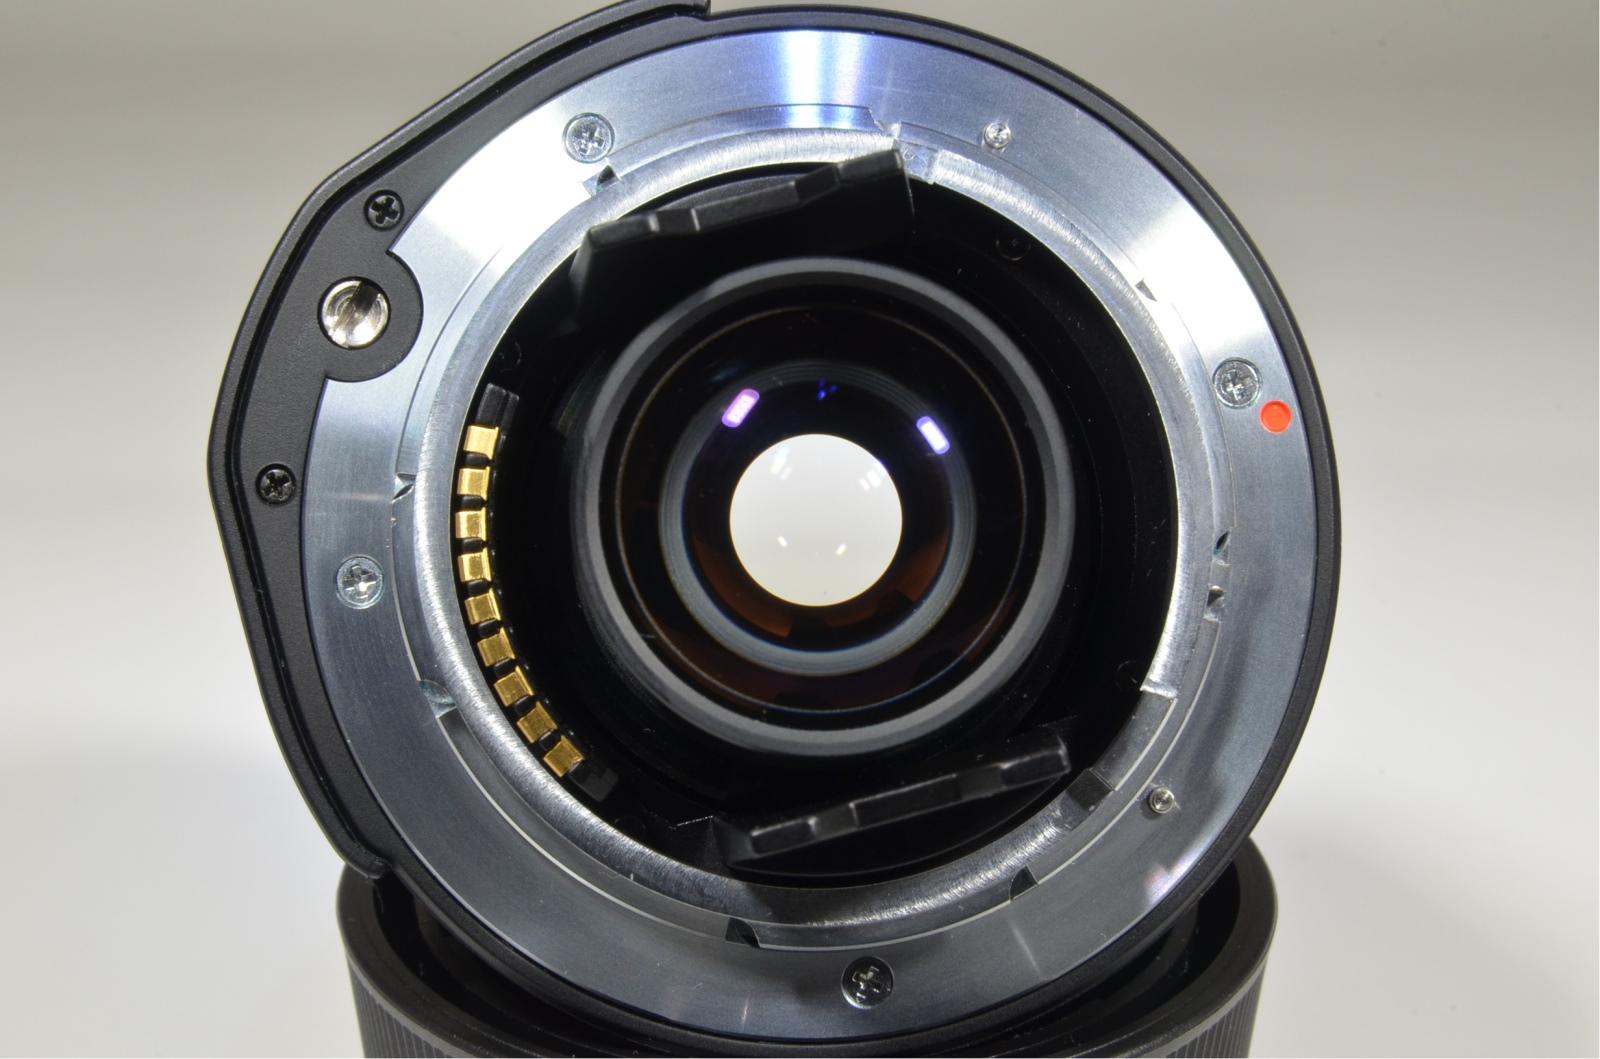 contax carl zeiss t* biogon 28mm f2.8 g lens